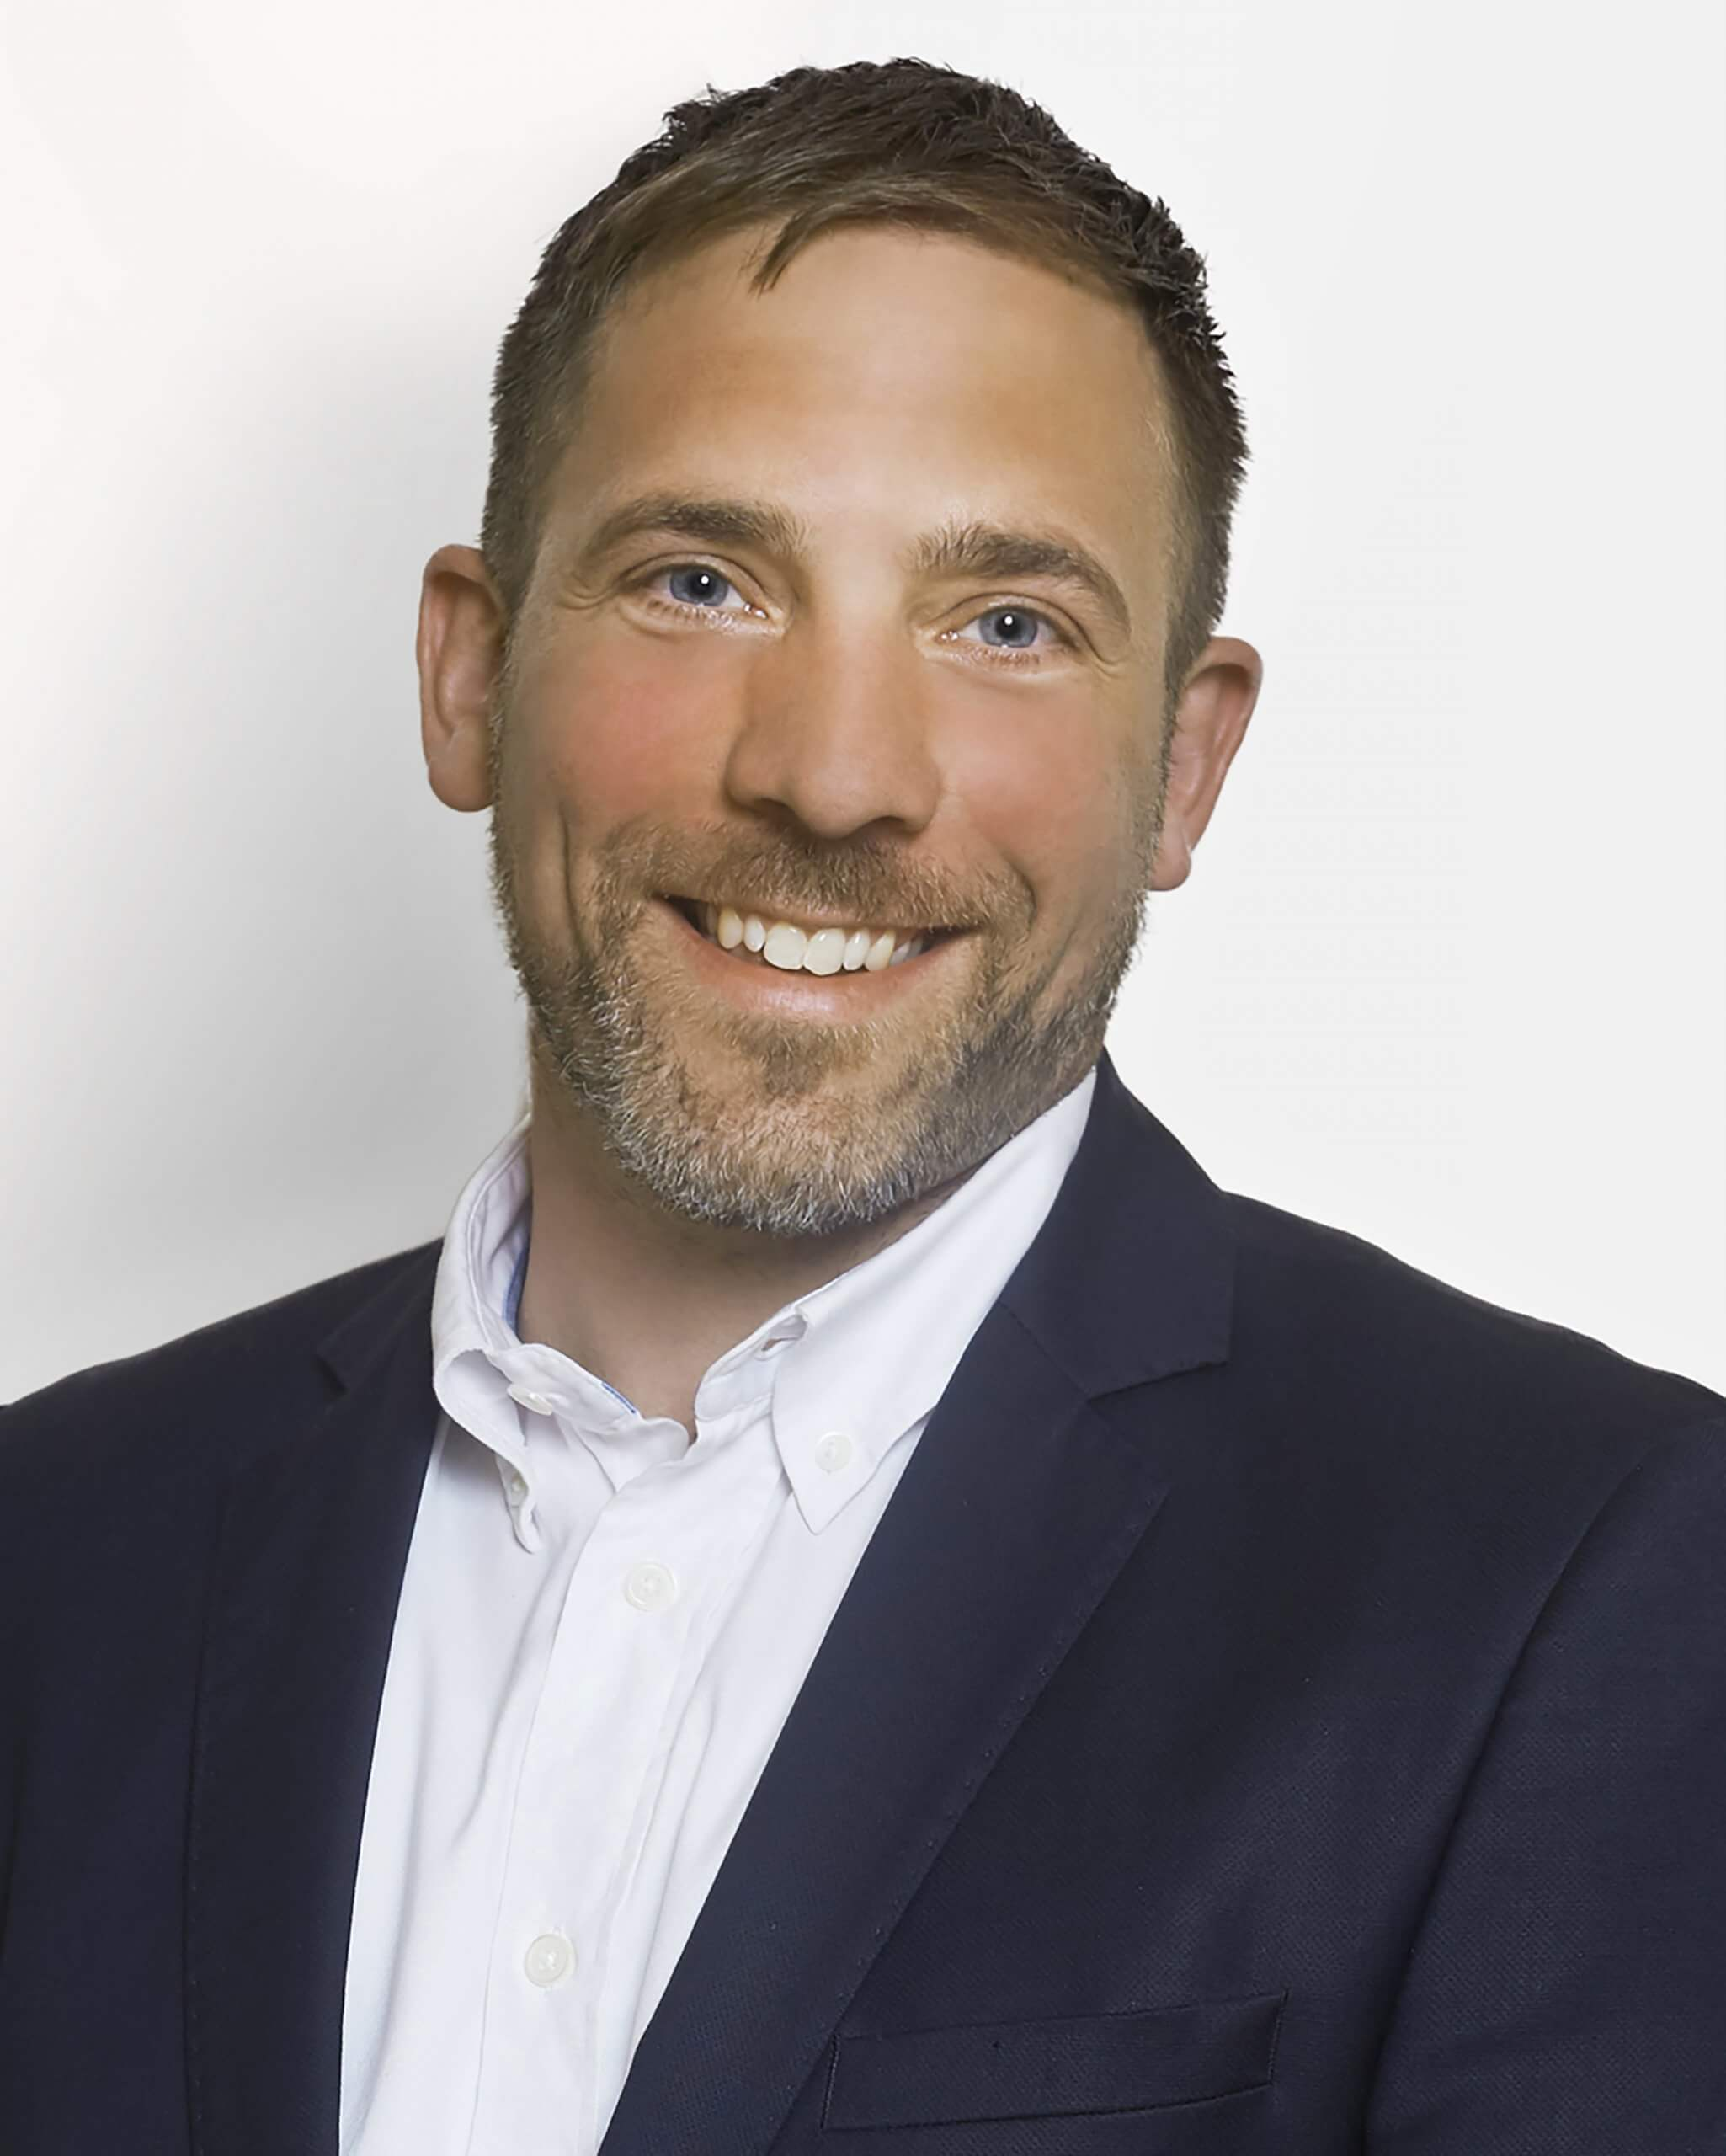 Rasmus Rørdam